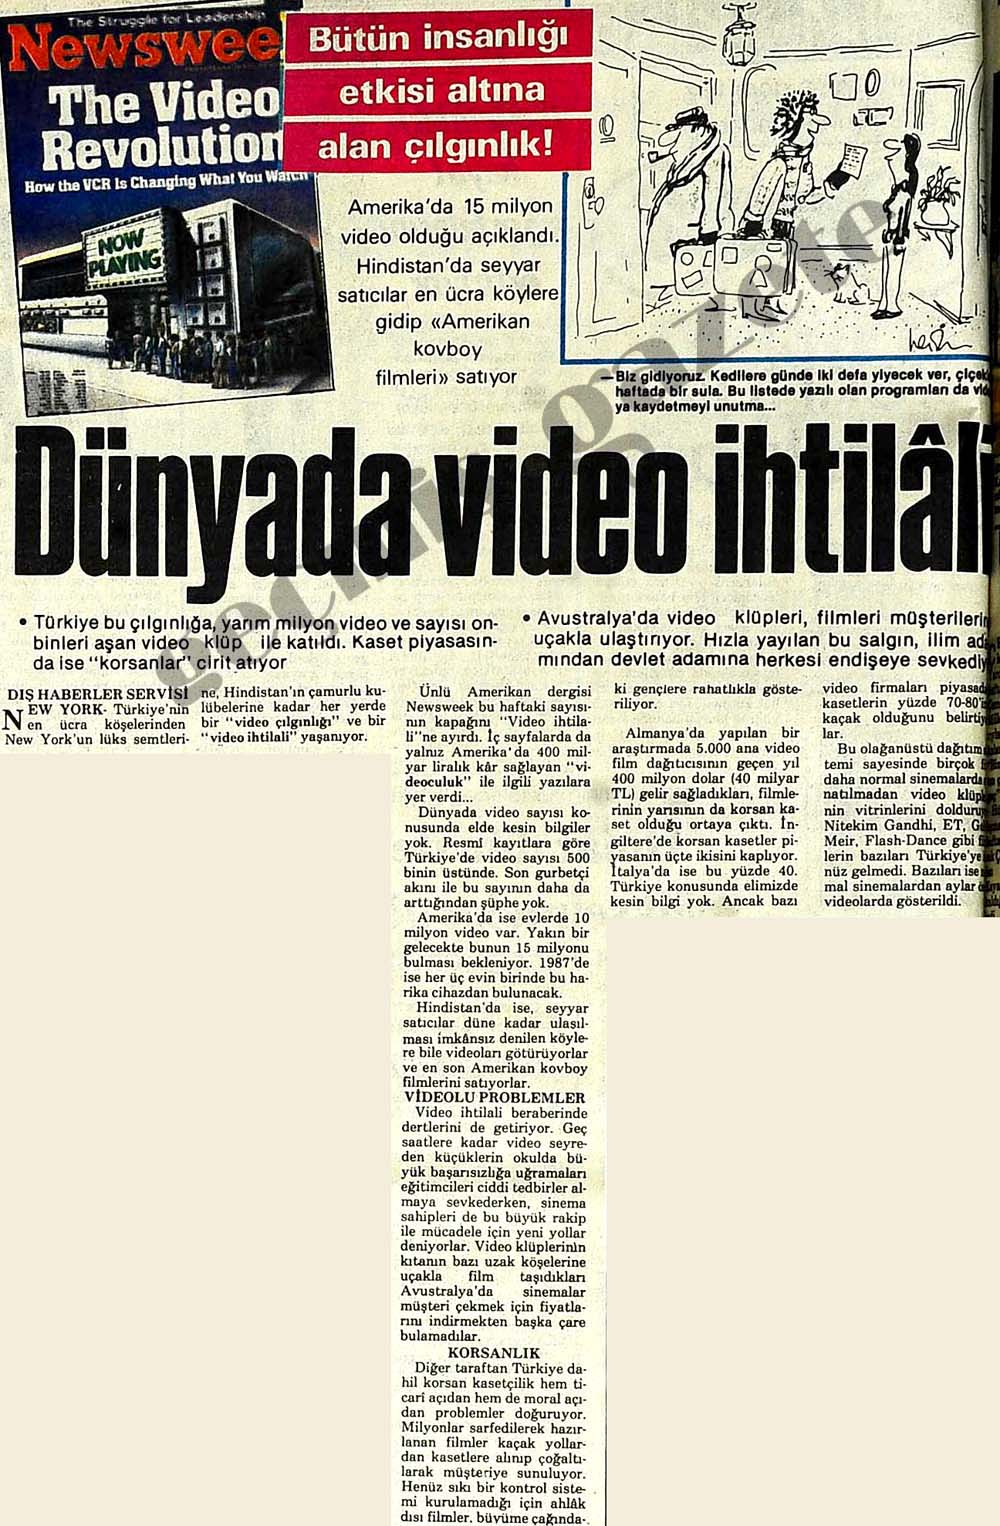 Dünyada video ihtilali